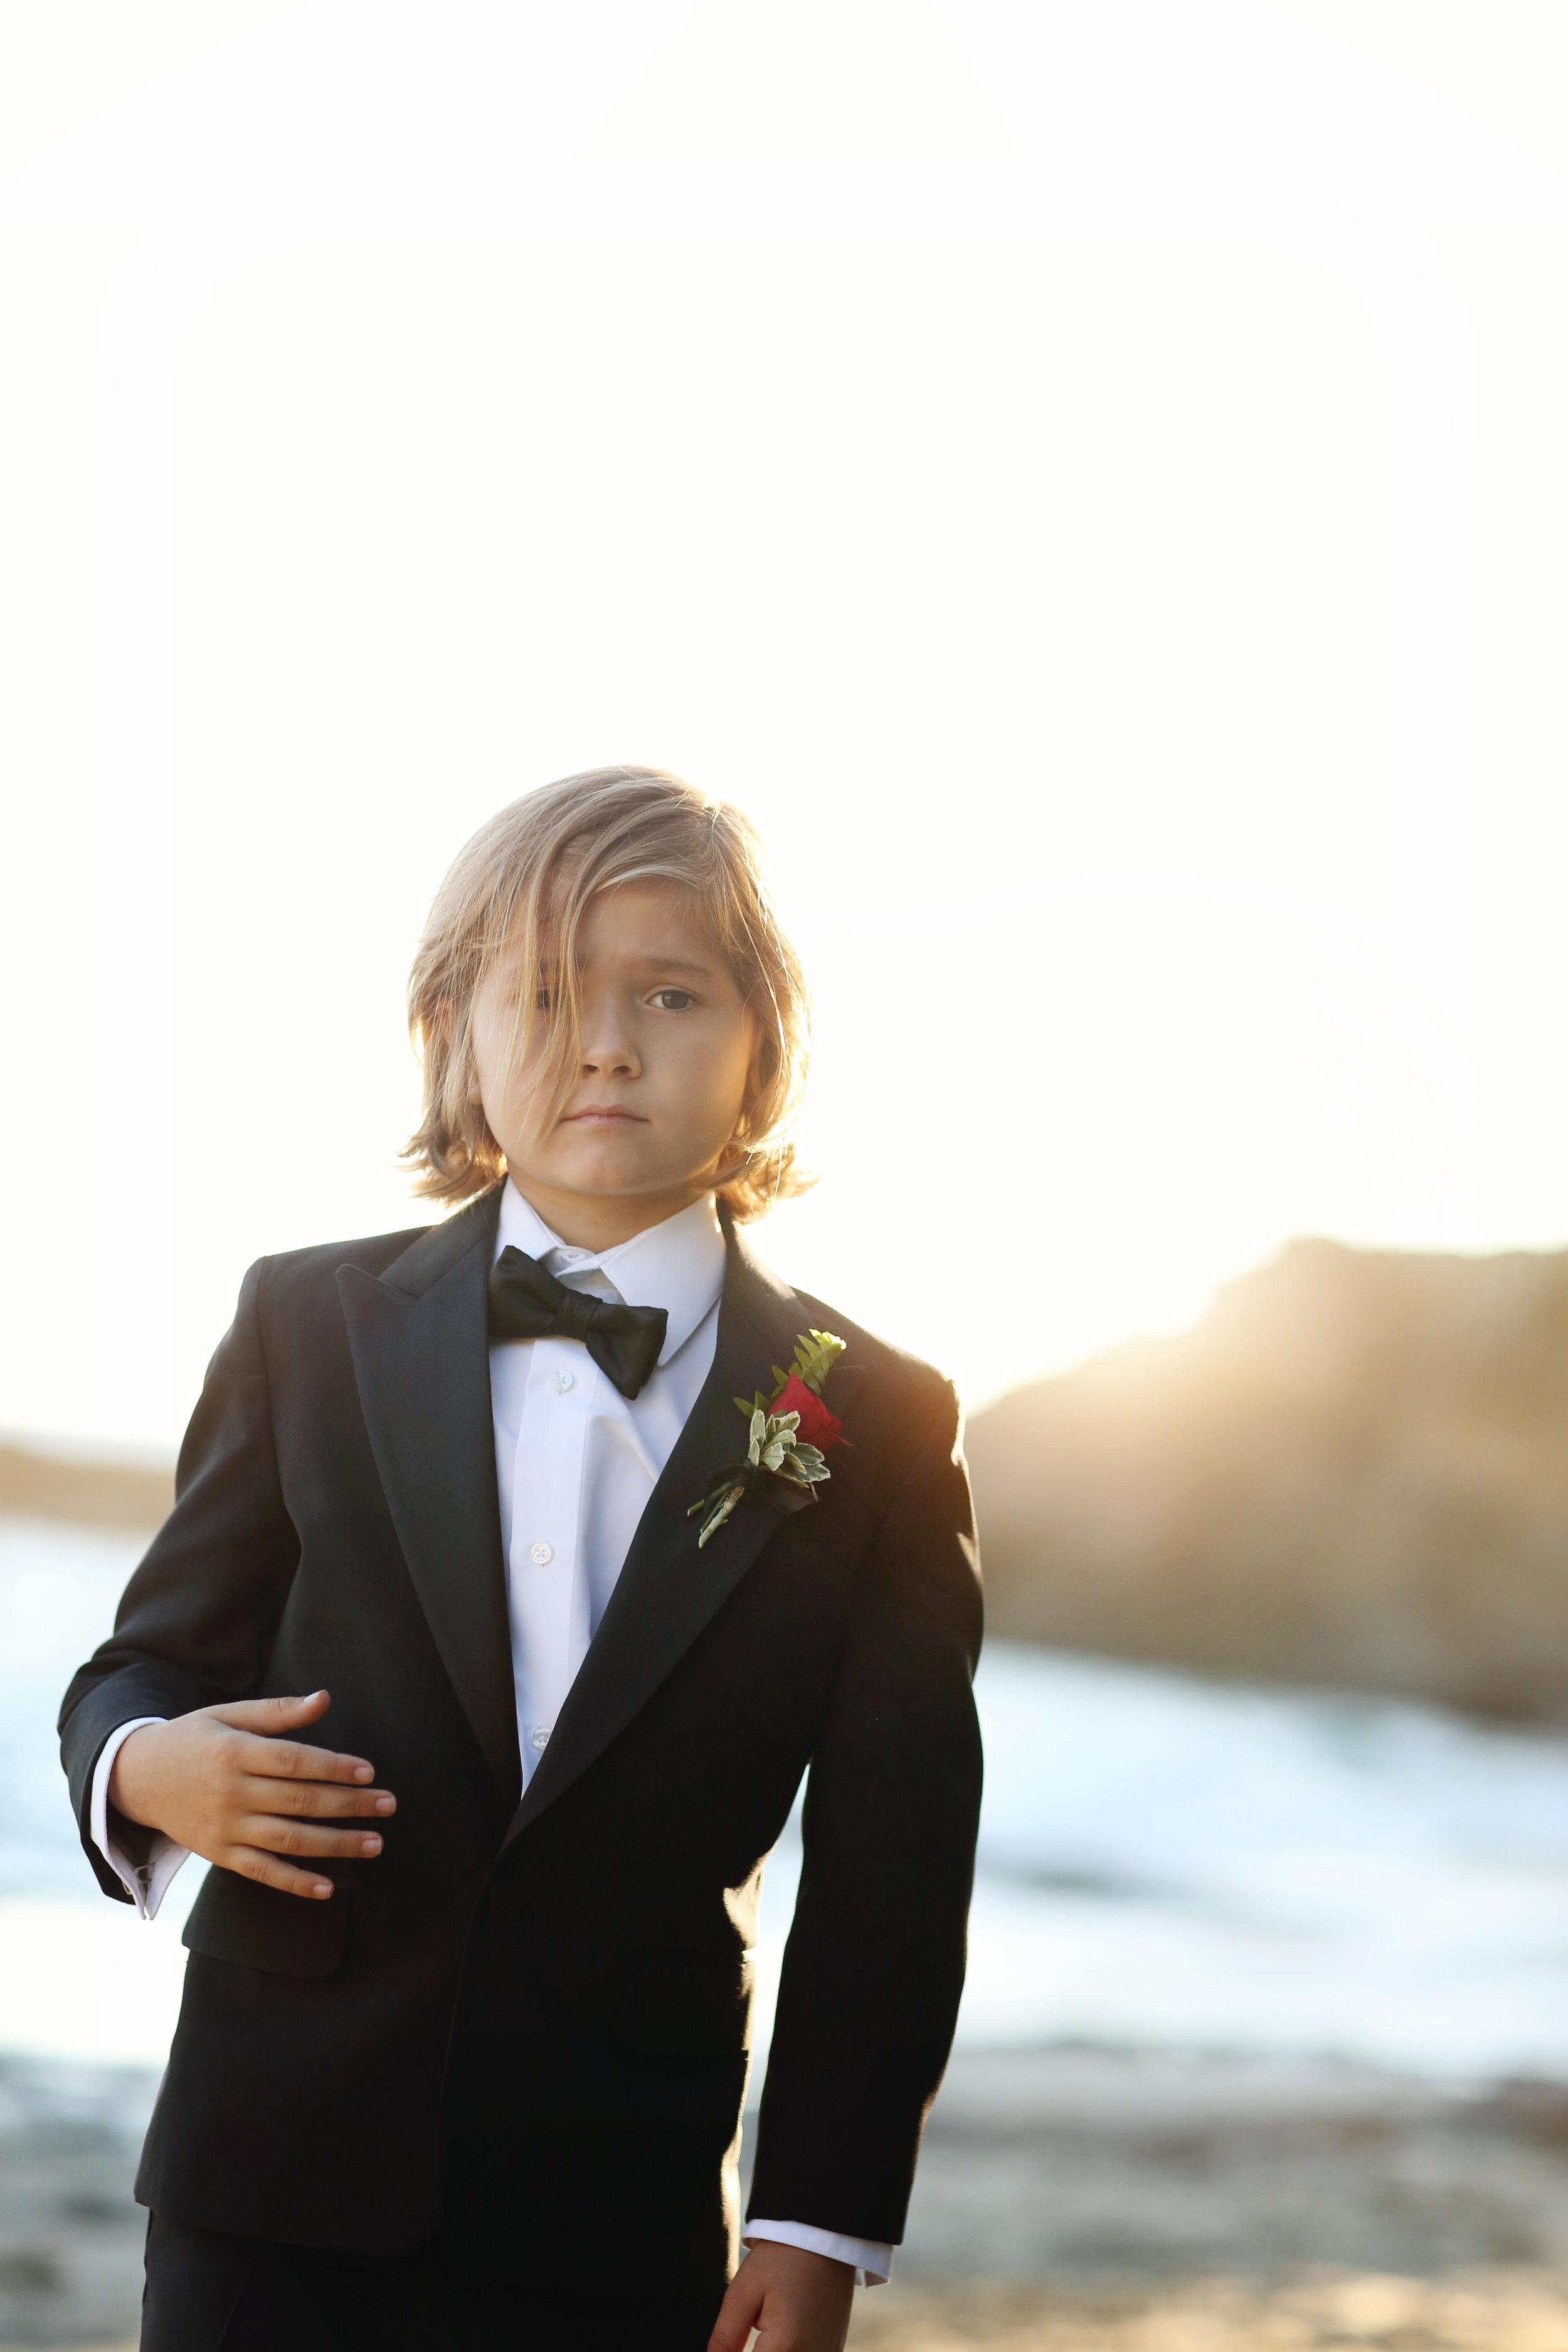 Beach Portrait of young boy in tuxedo at San Clemente Beach. Orange County